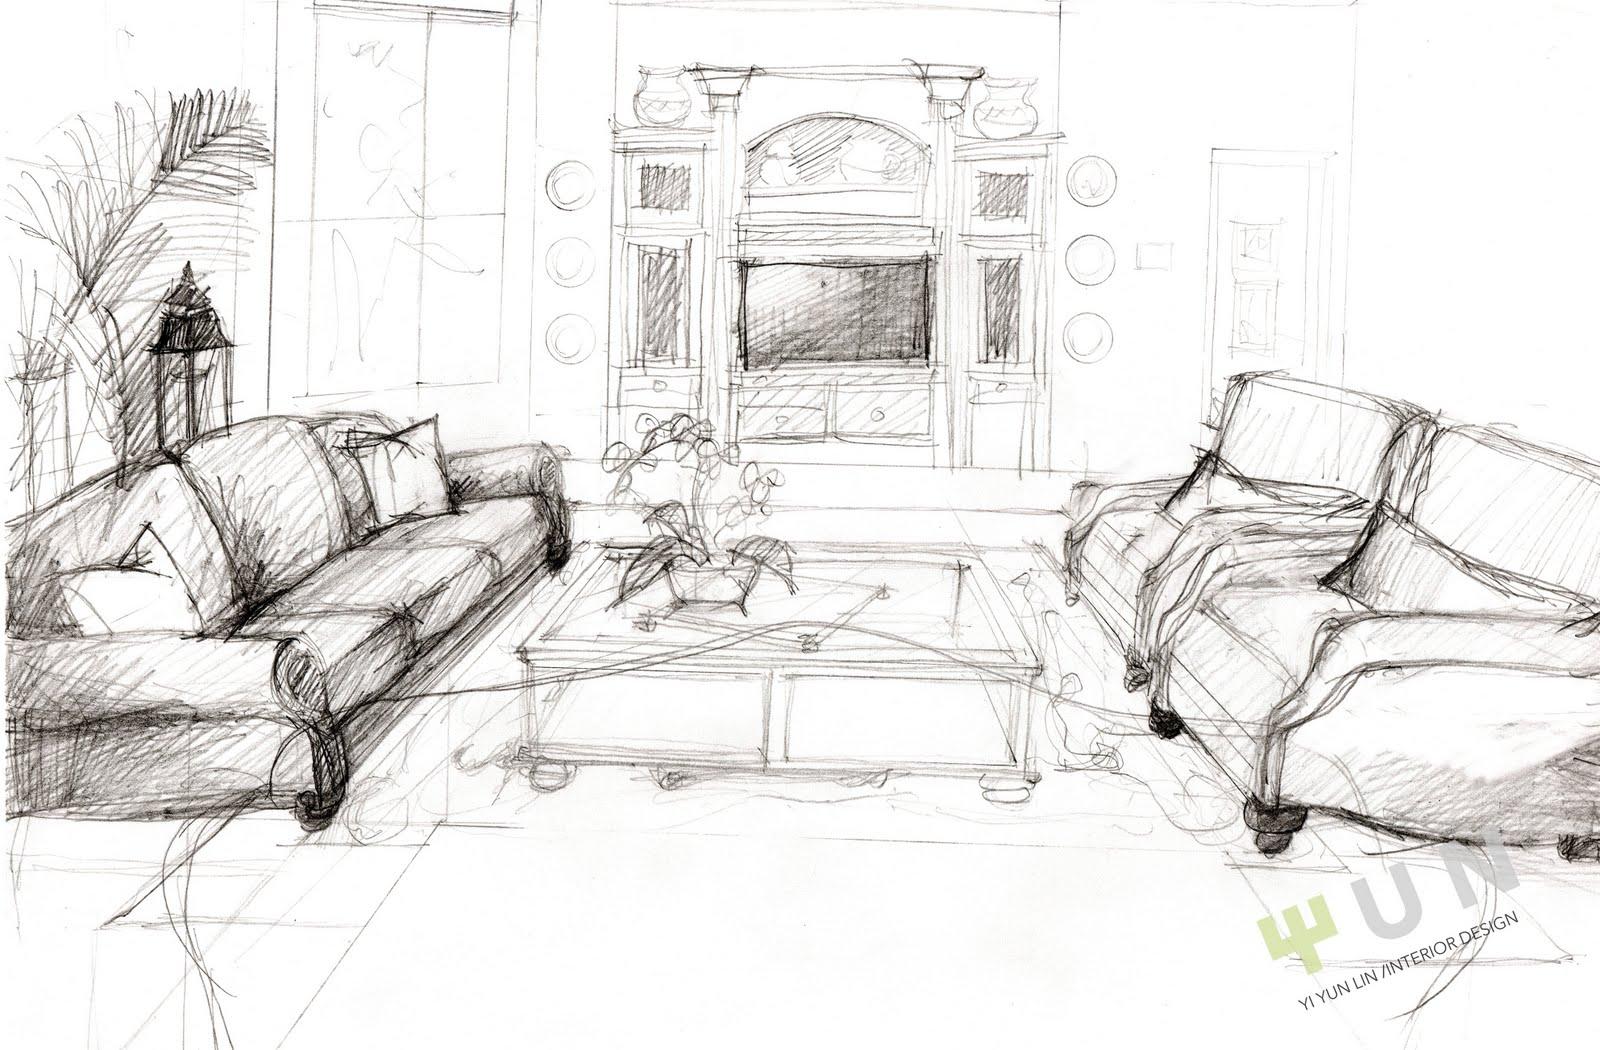 interior design sketches - Interior Design Sketches